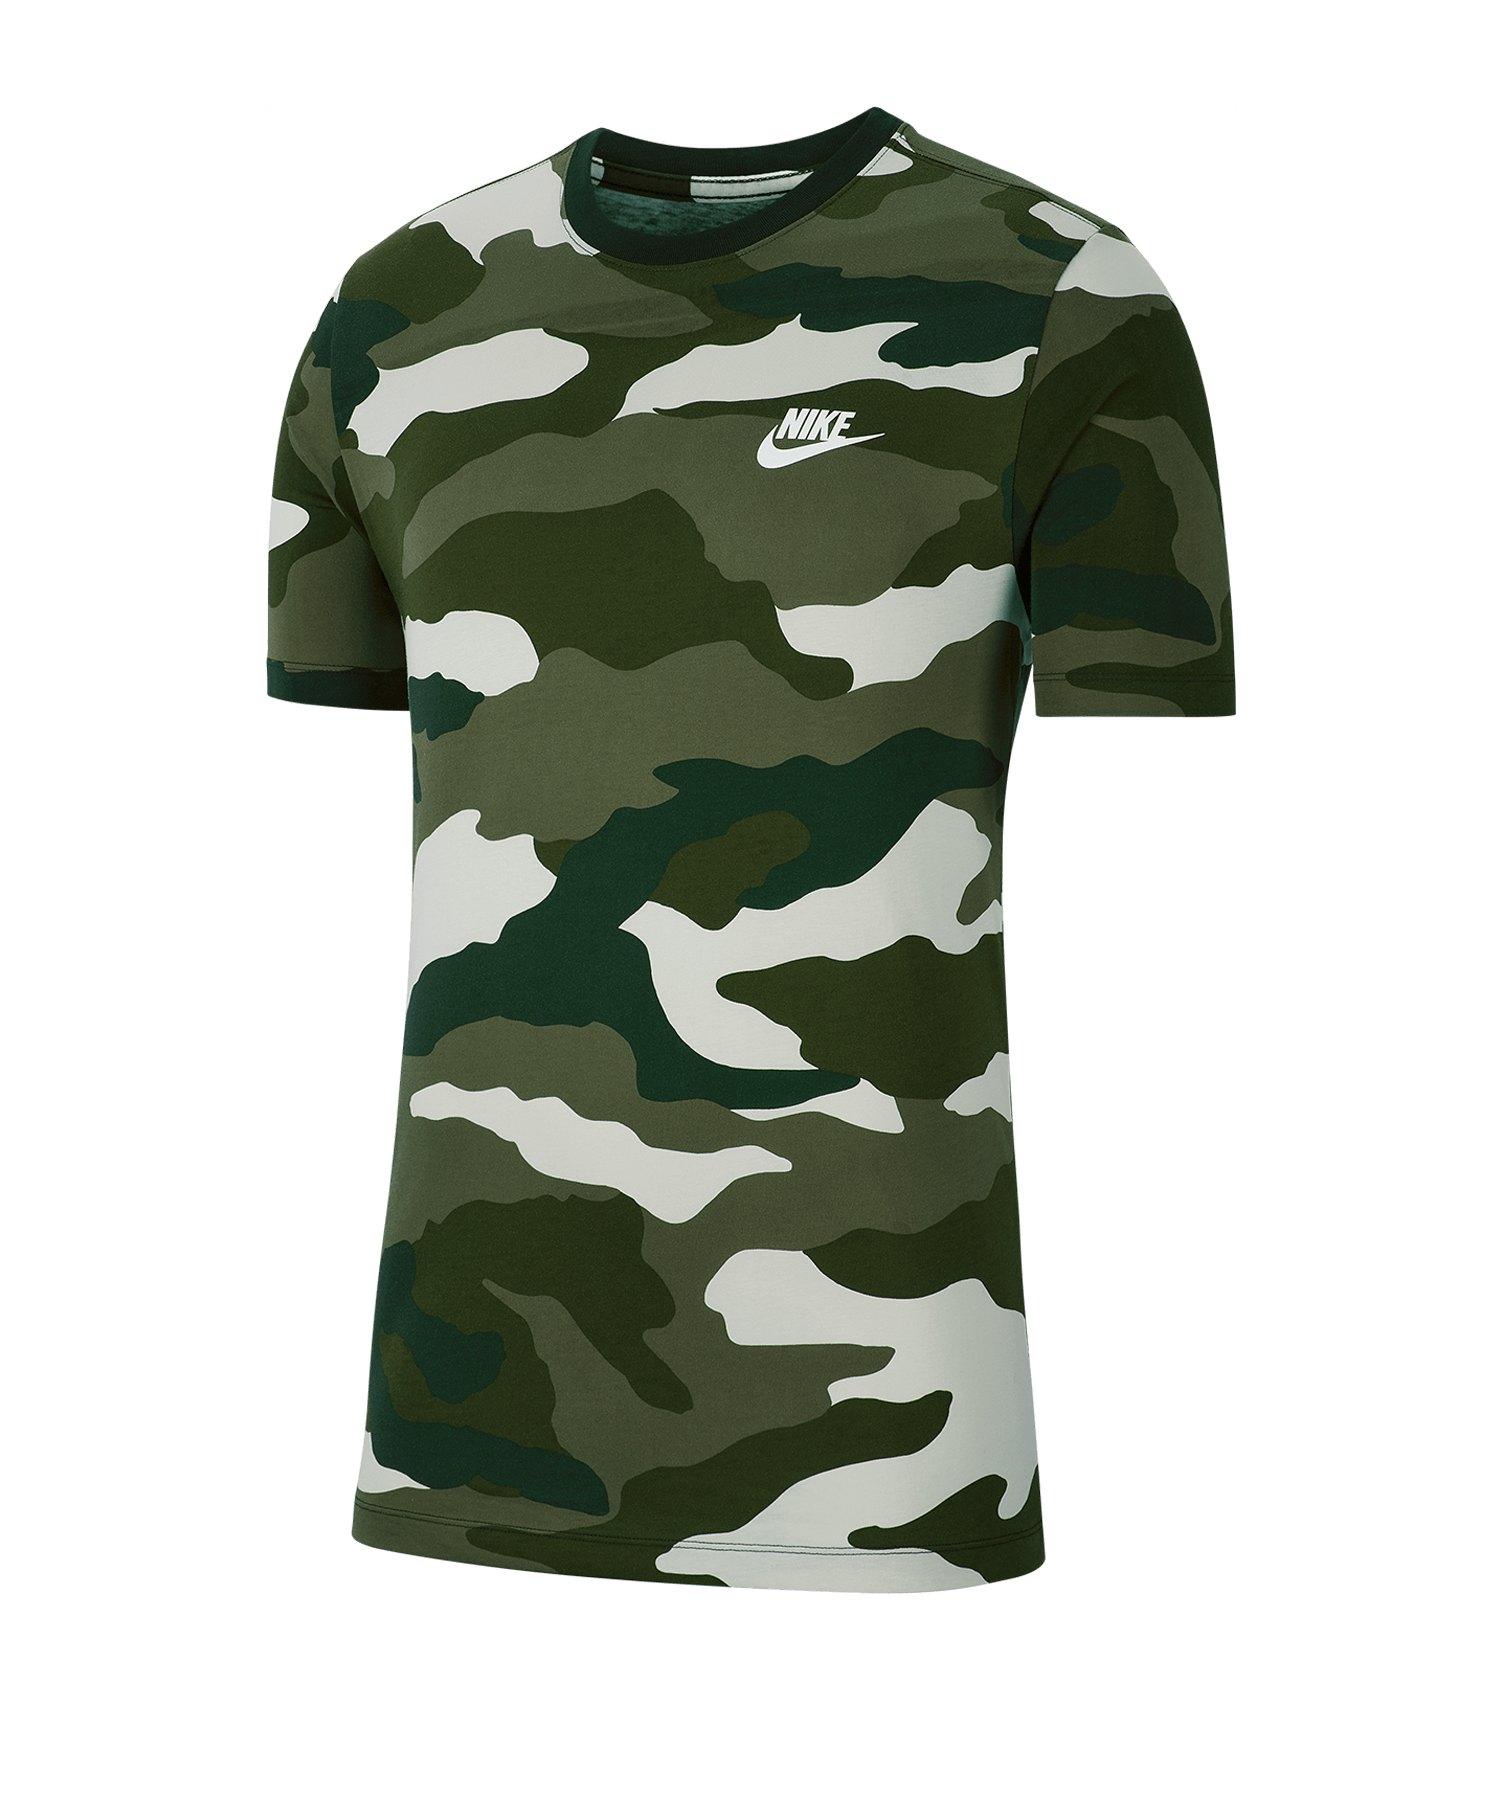 Nike AOP Camo Tee T-Shirt Beige F072 - beige